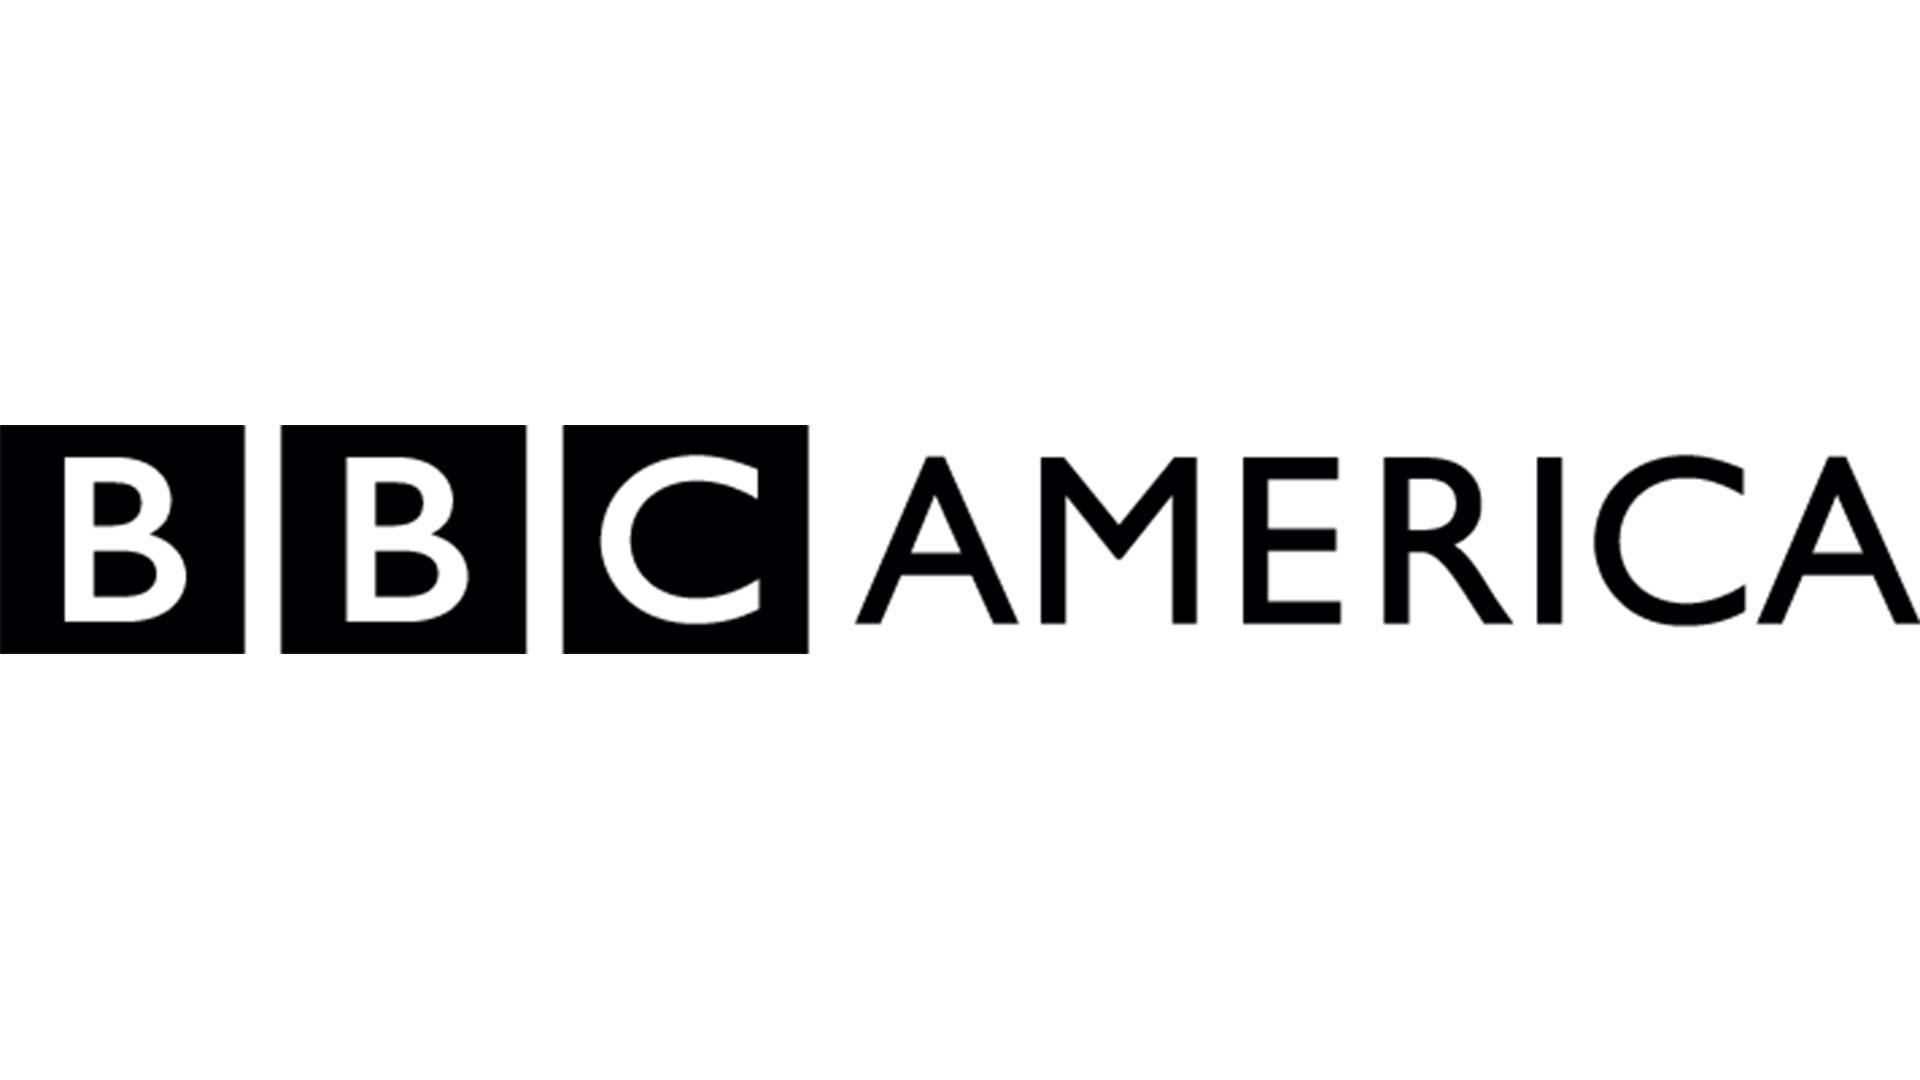 BBCA_horizontal_logo